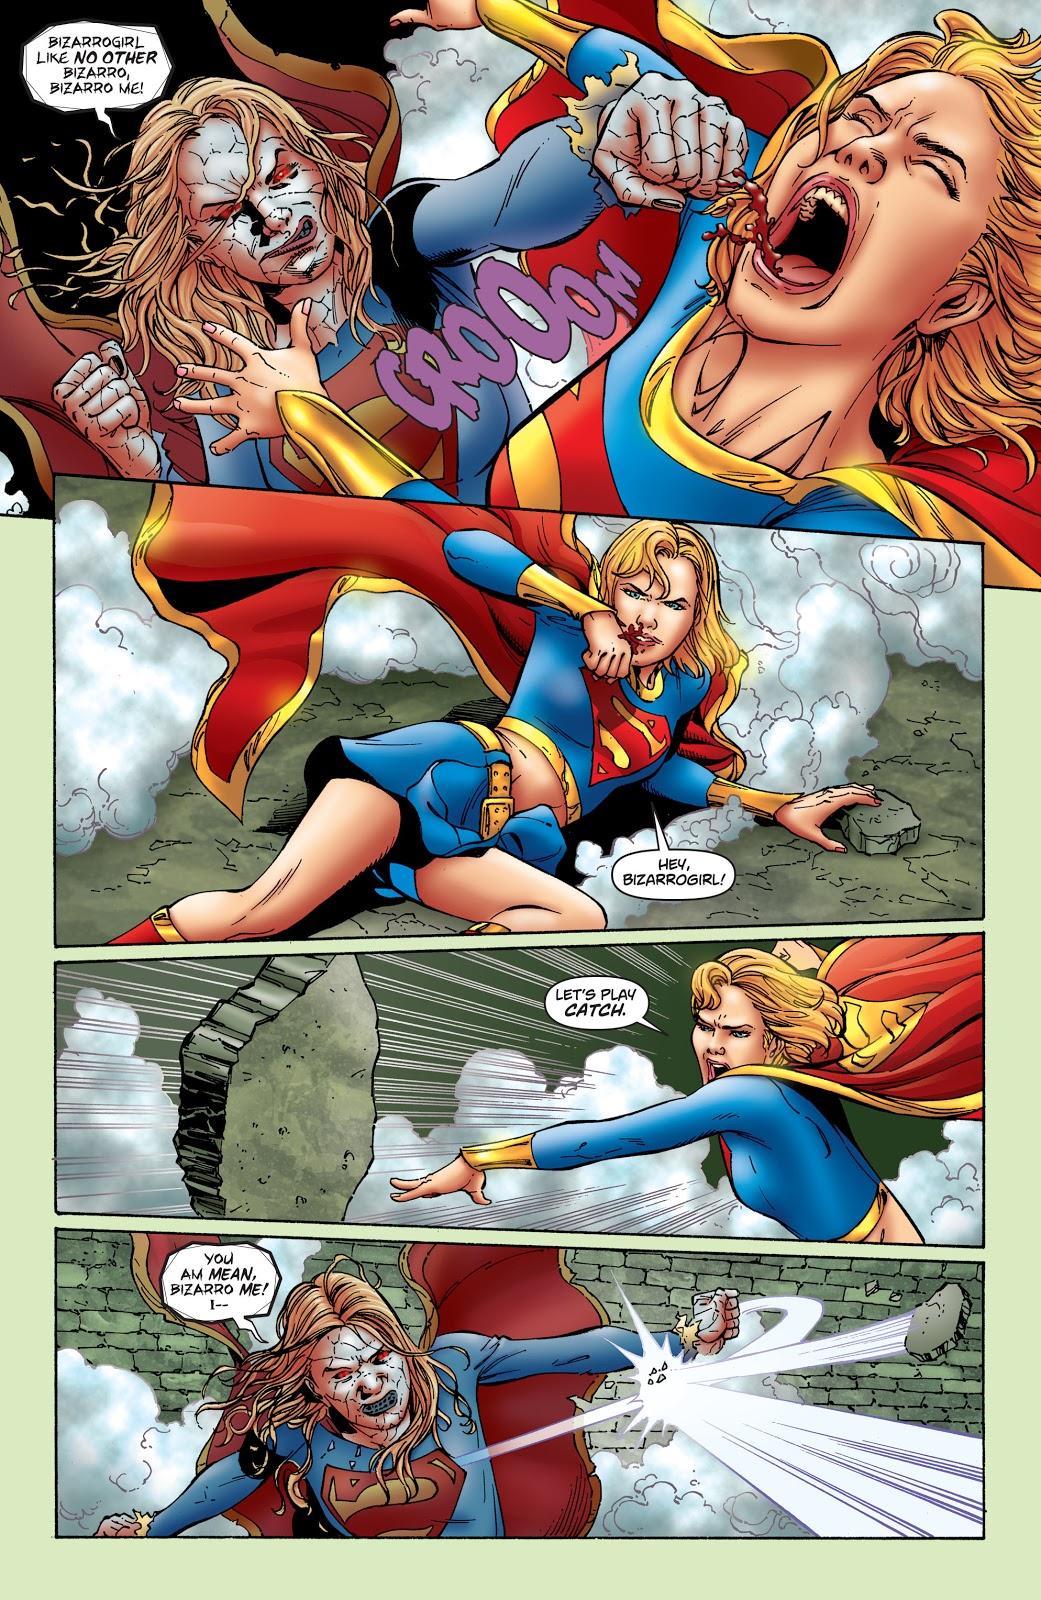 Supergirl Bizarrogirl review